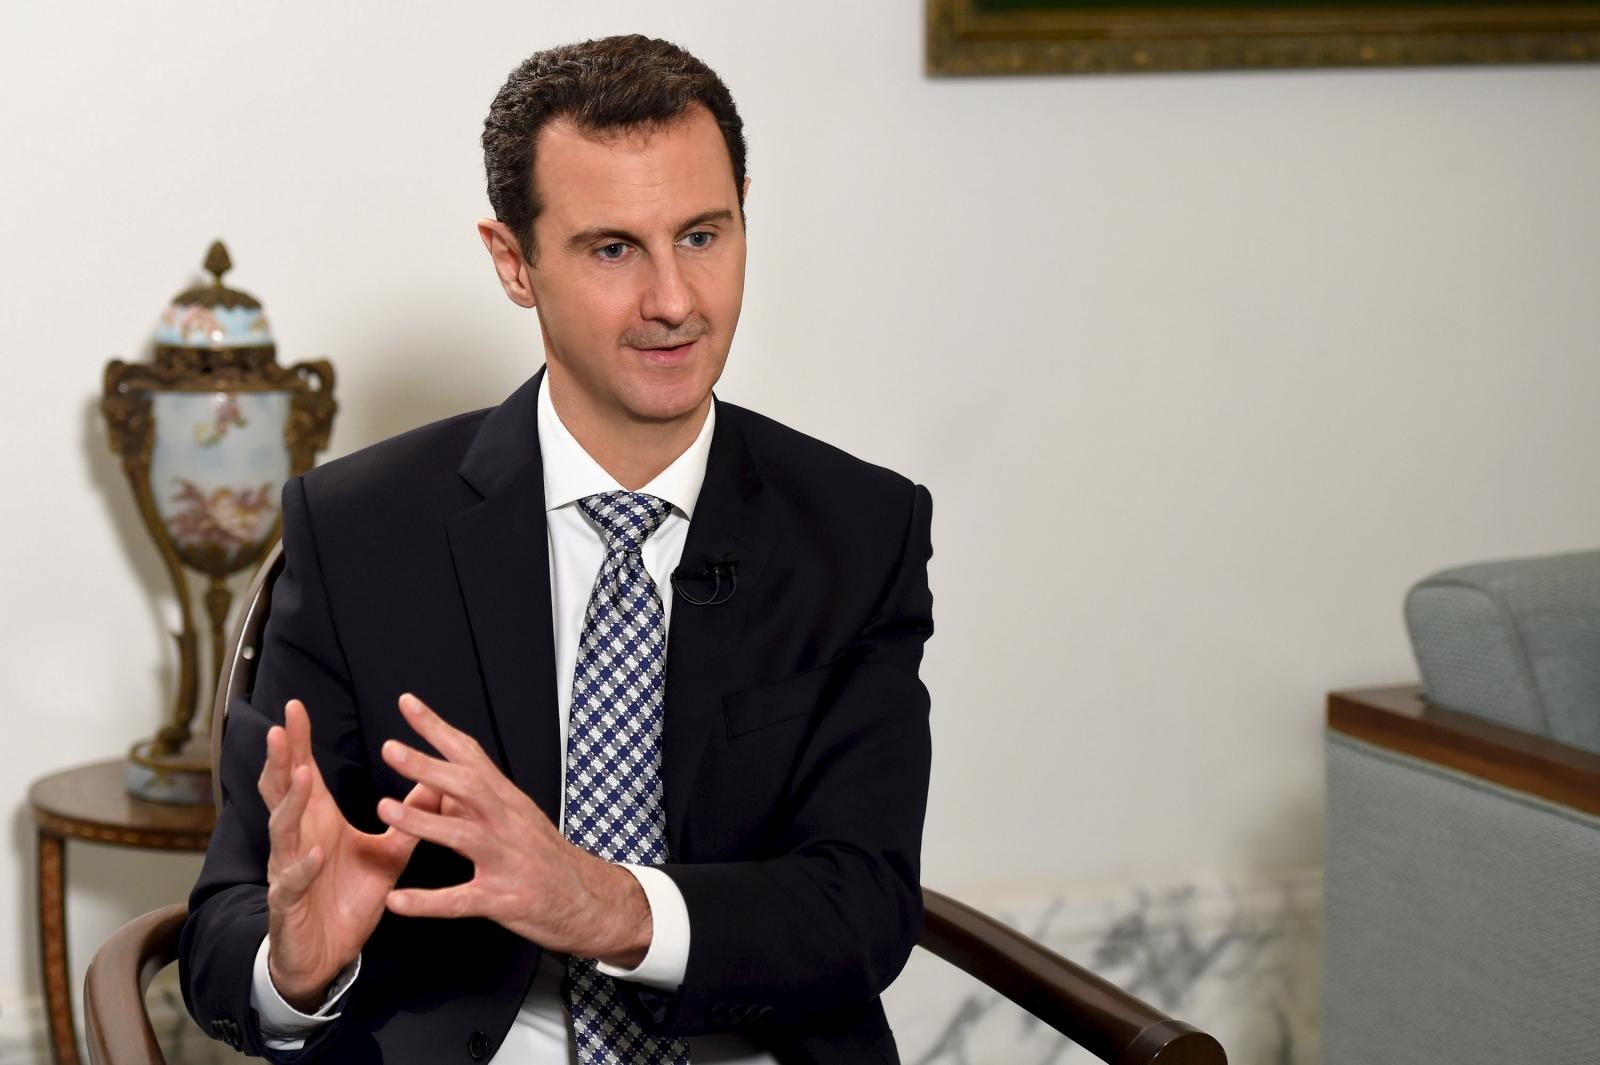 Syrian President Bashar al-Assad takes to Instagram to celebrate Aleppo victory - report